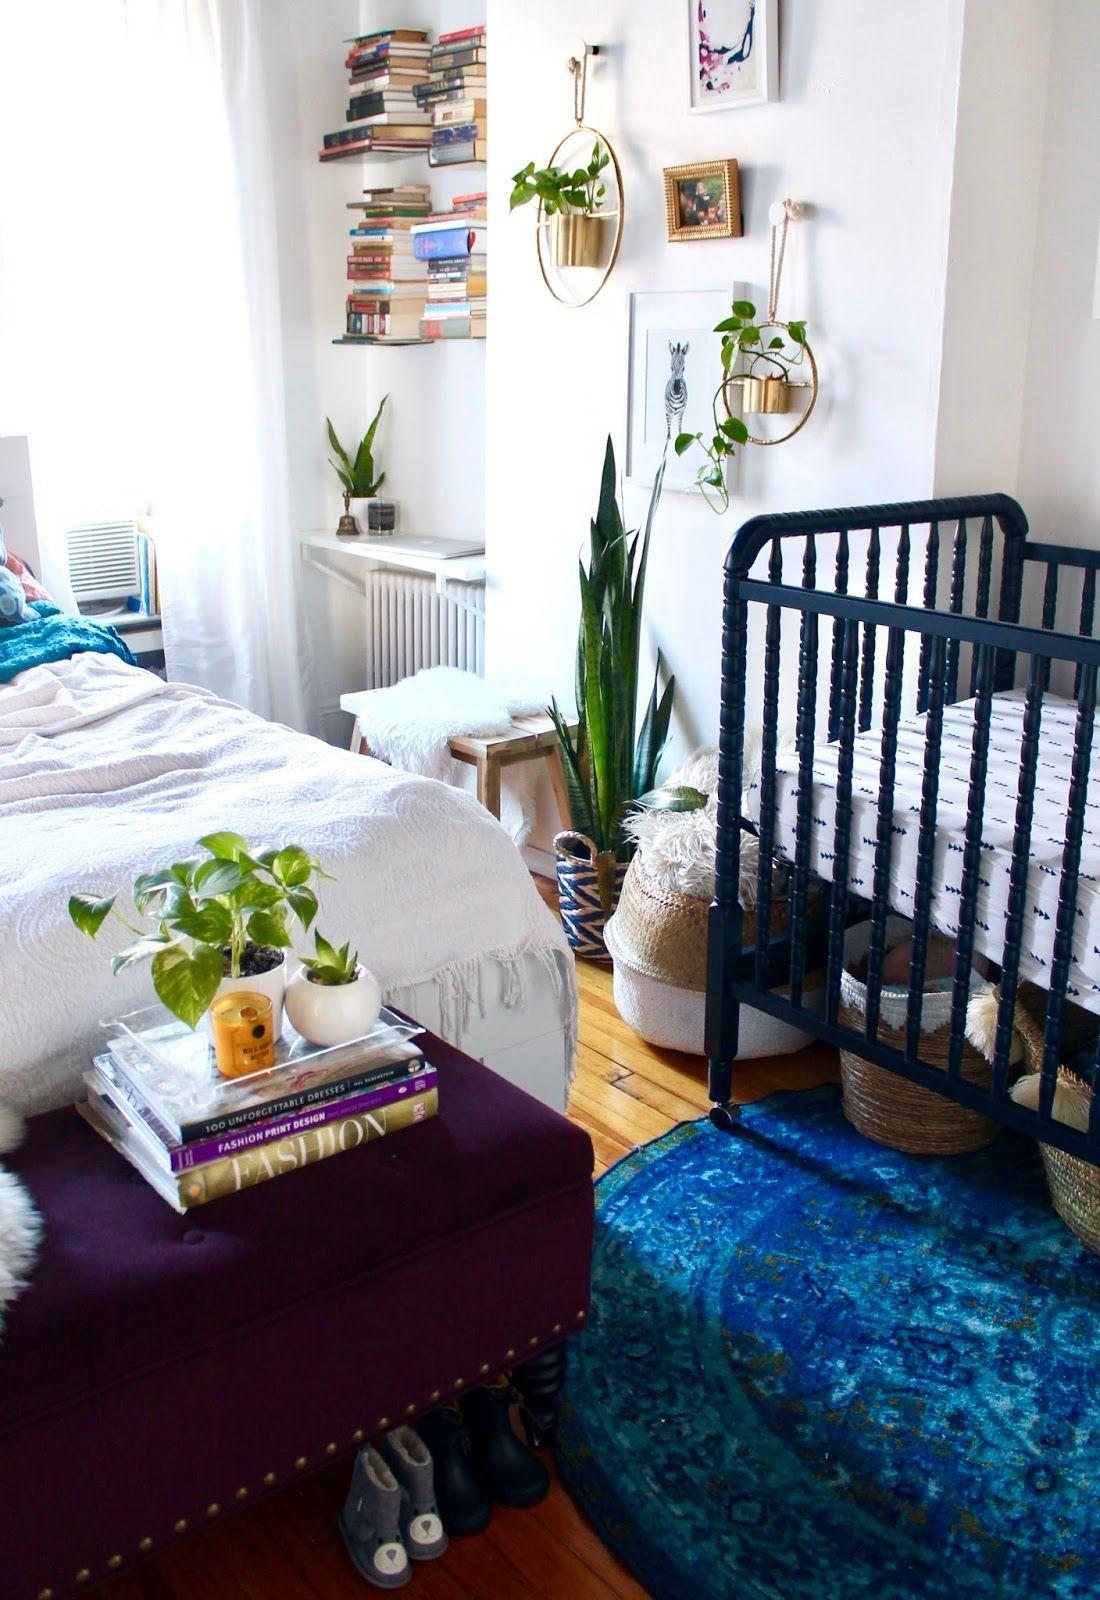 Boho Shared Master Bedroom X Nursery Nursery Nook Small Master Bedroom Best Baby Cribs